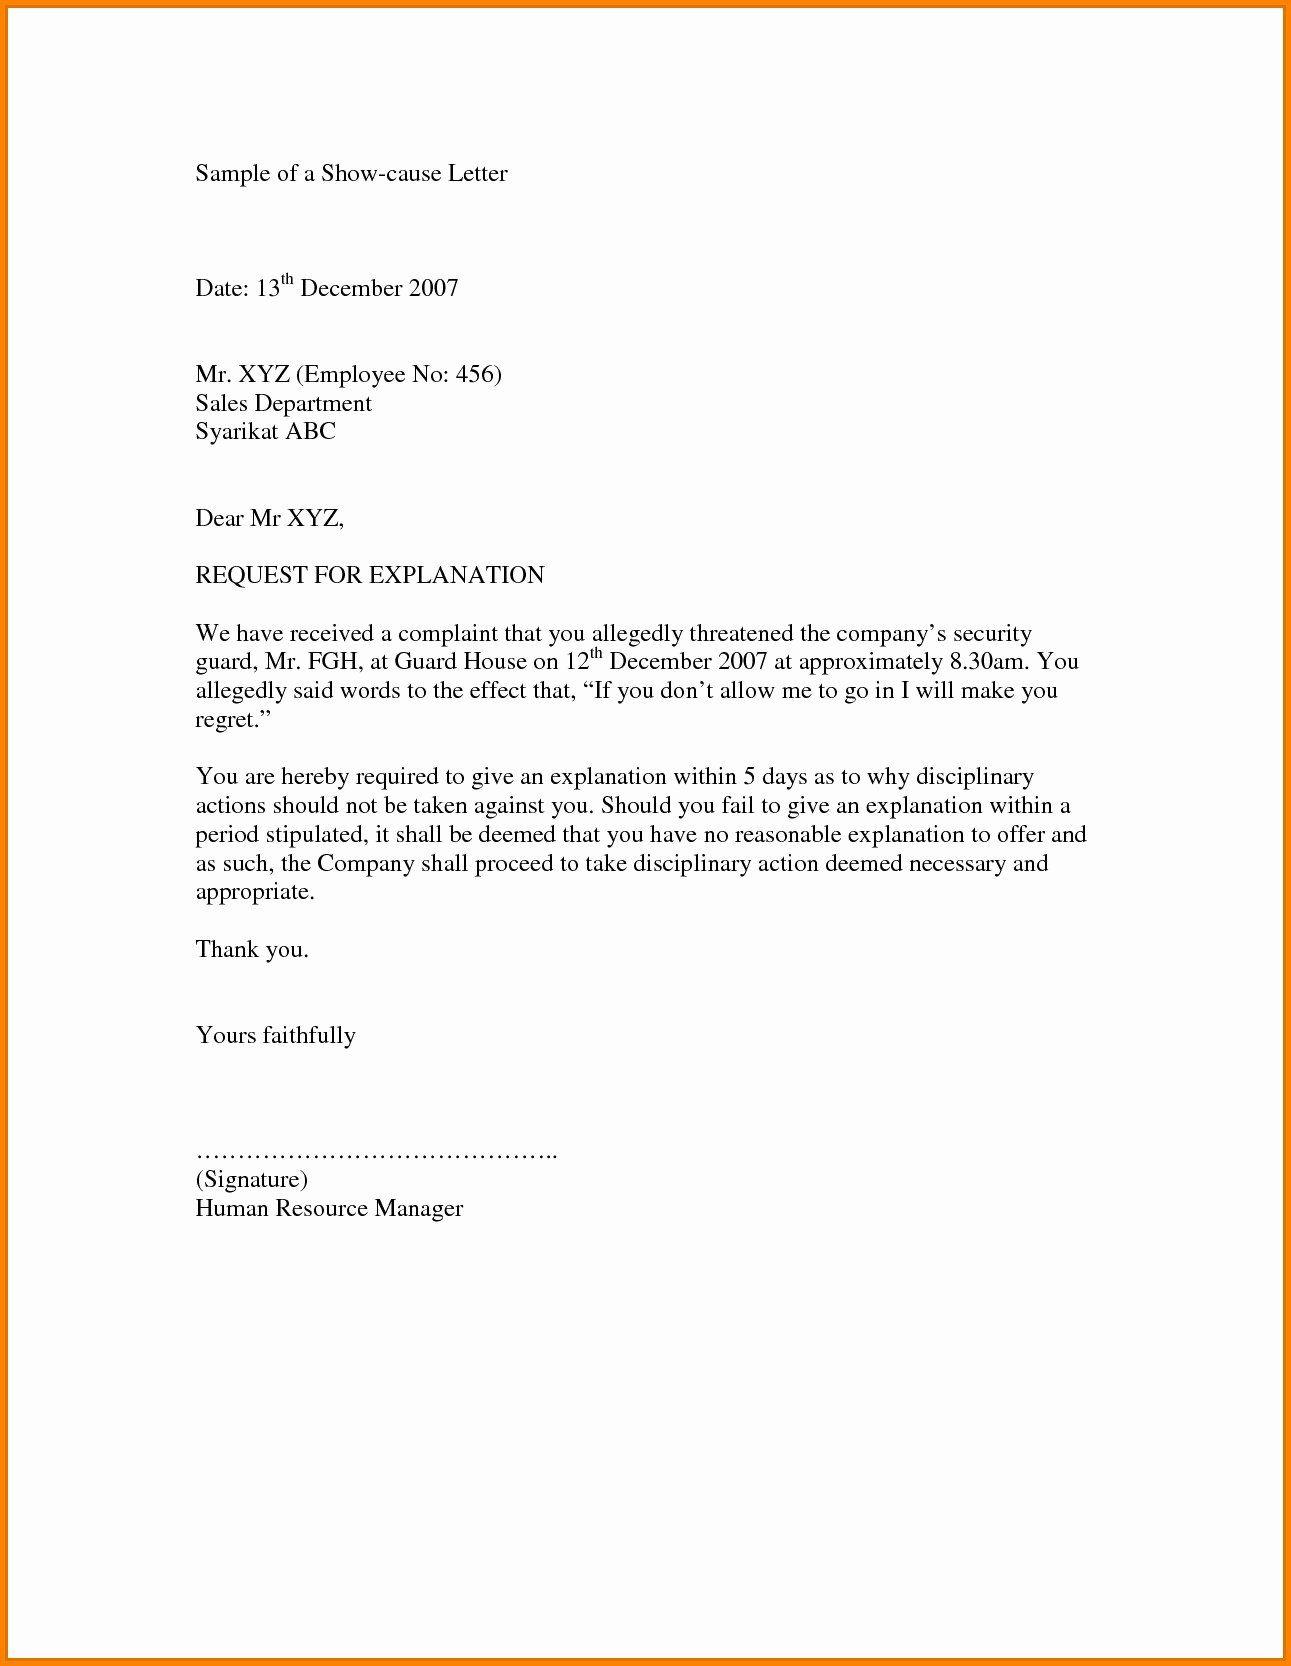 Sample Letter Of Explanation For Cash Out Refinance Luxury Cash Out Refinance Letter Explanation Template Lettering Explanation Letter Of Recommendation Format